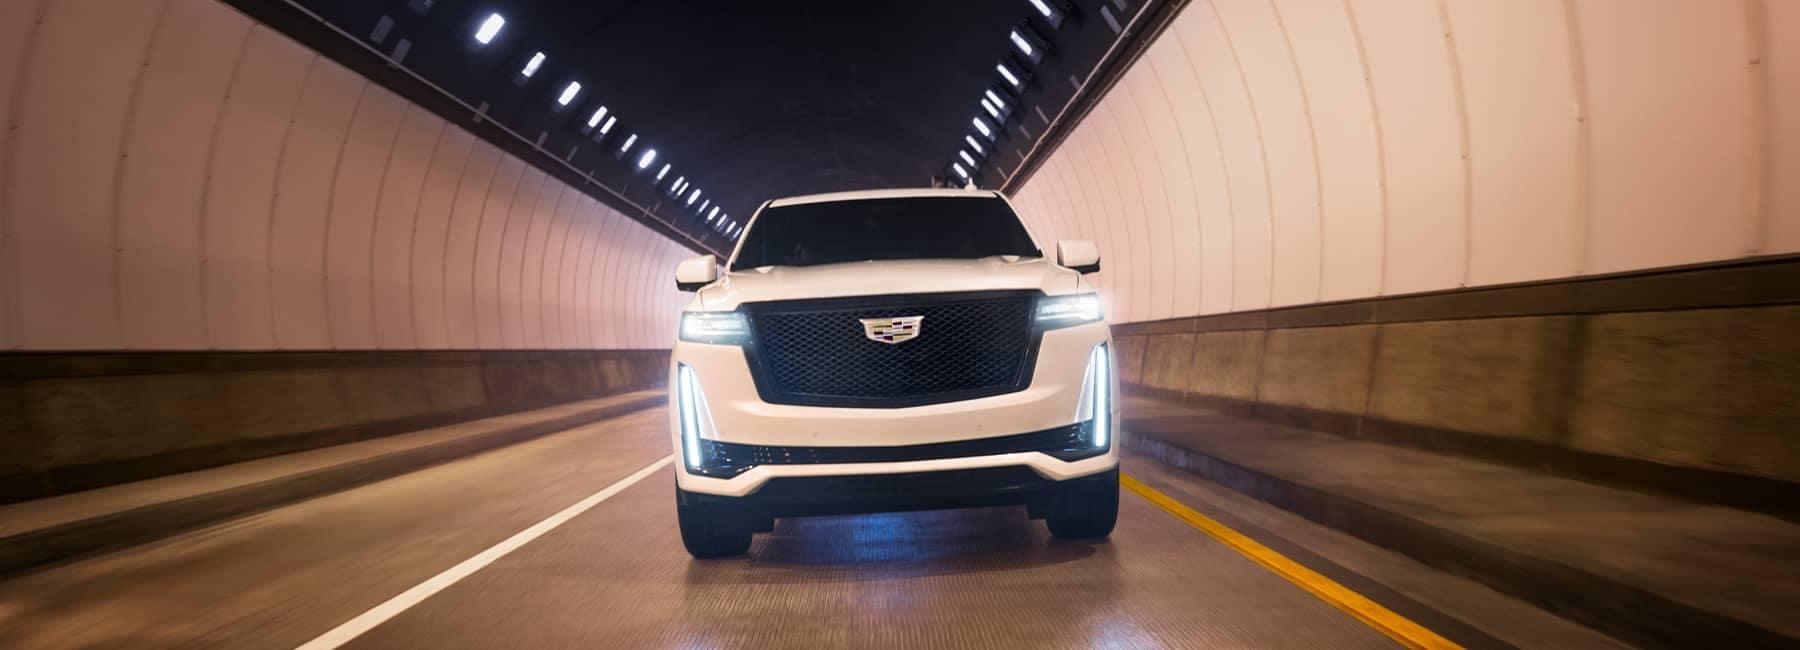 2021 Cadillac Escalade on the road at night